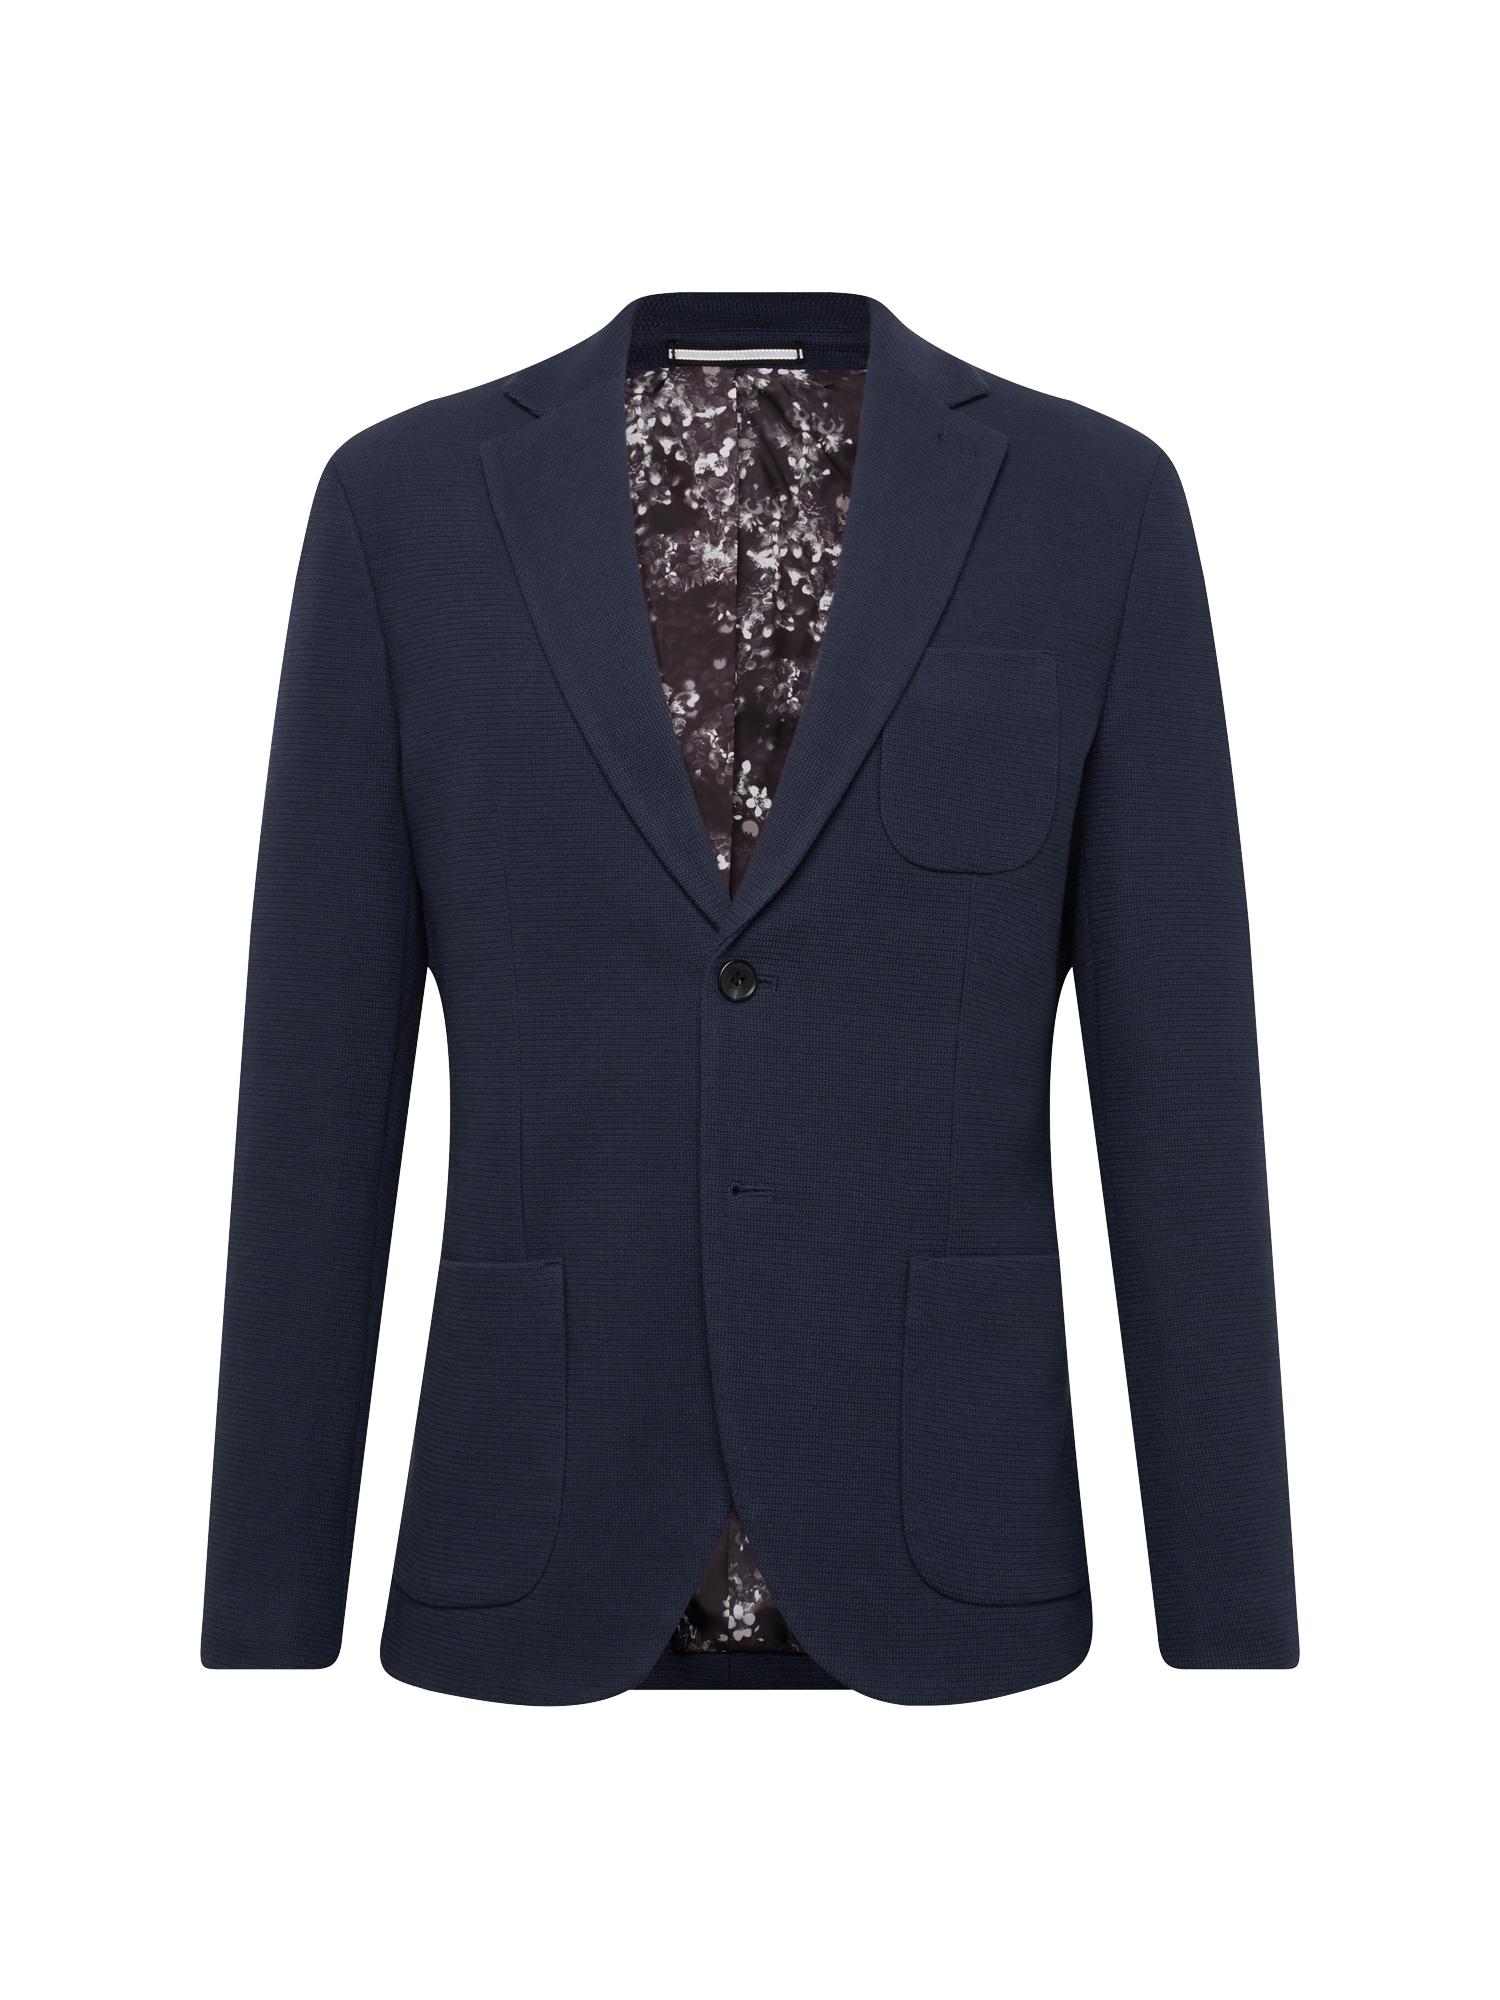 Oblek SLHSLIM-HALE NAVY BLAZER B tmavě modrá SELECTED HOMME